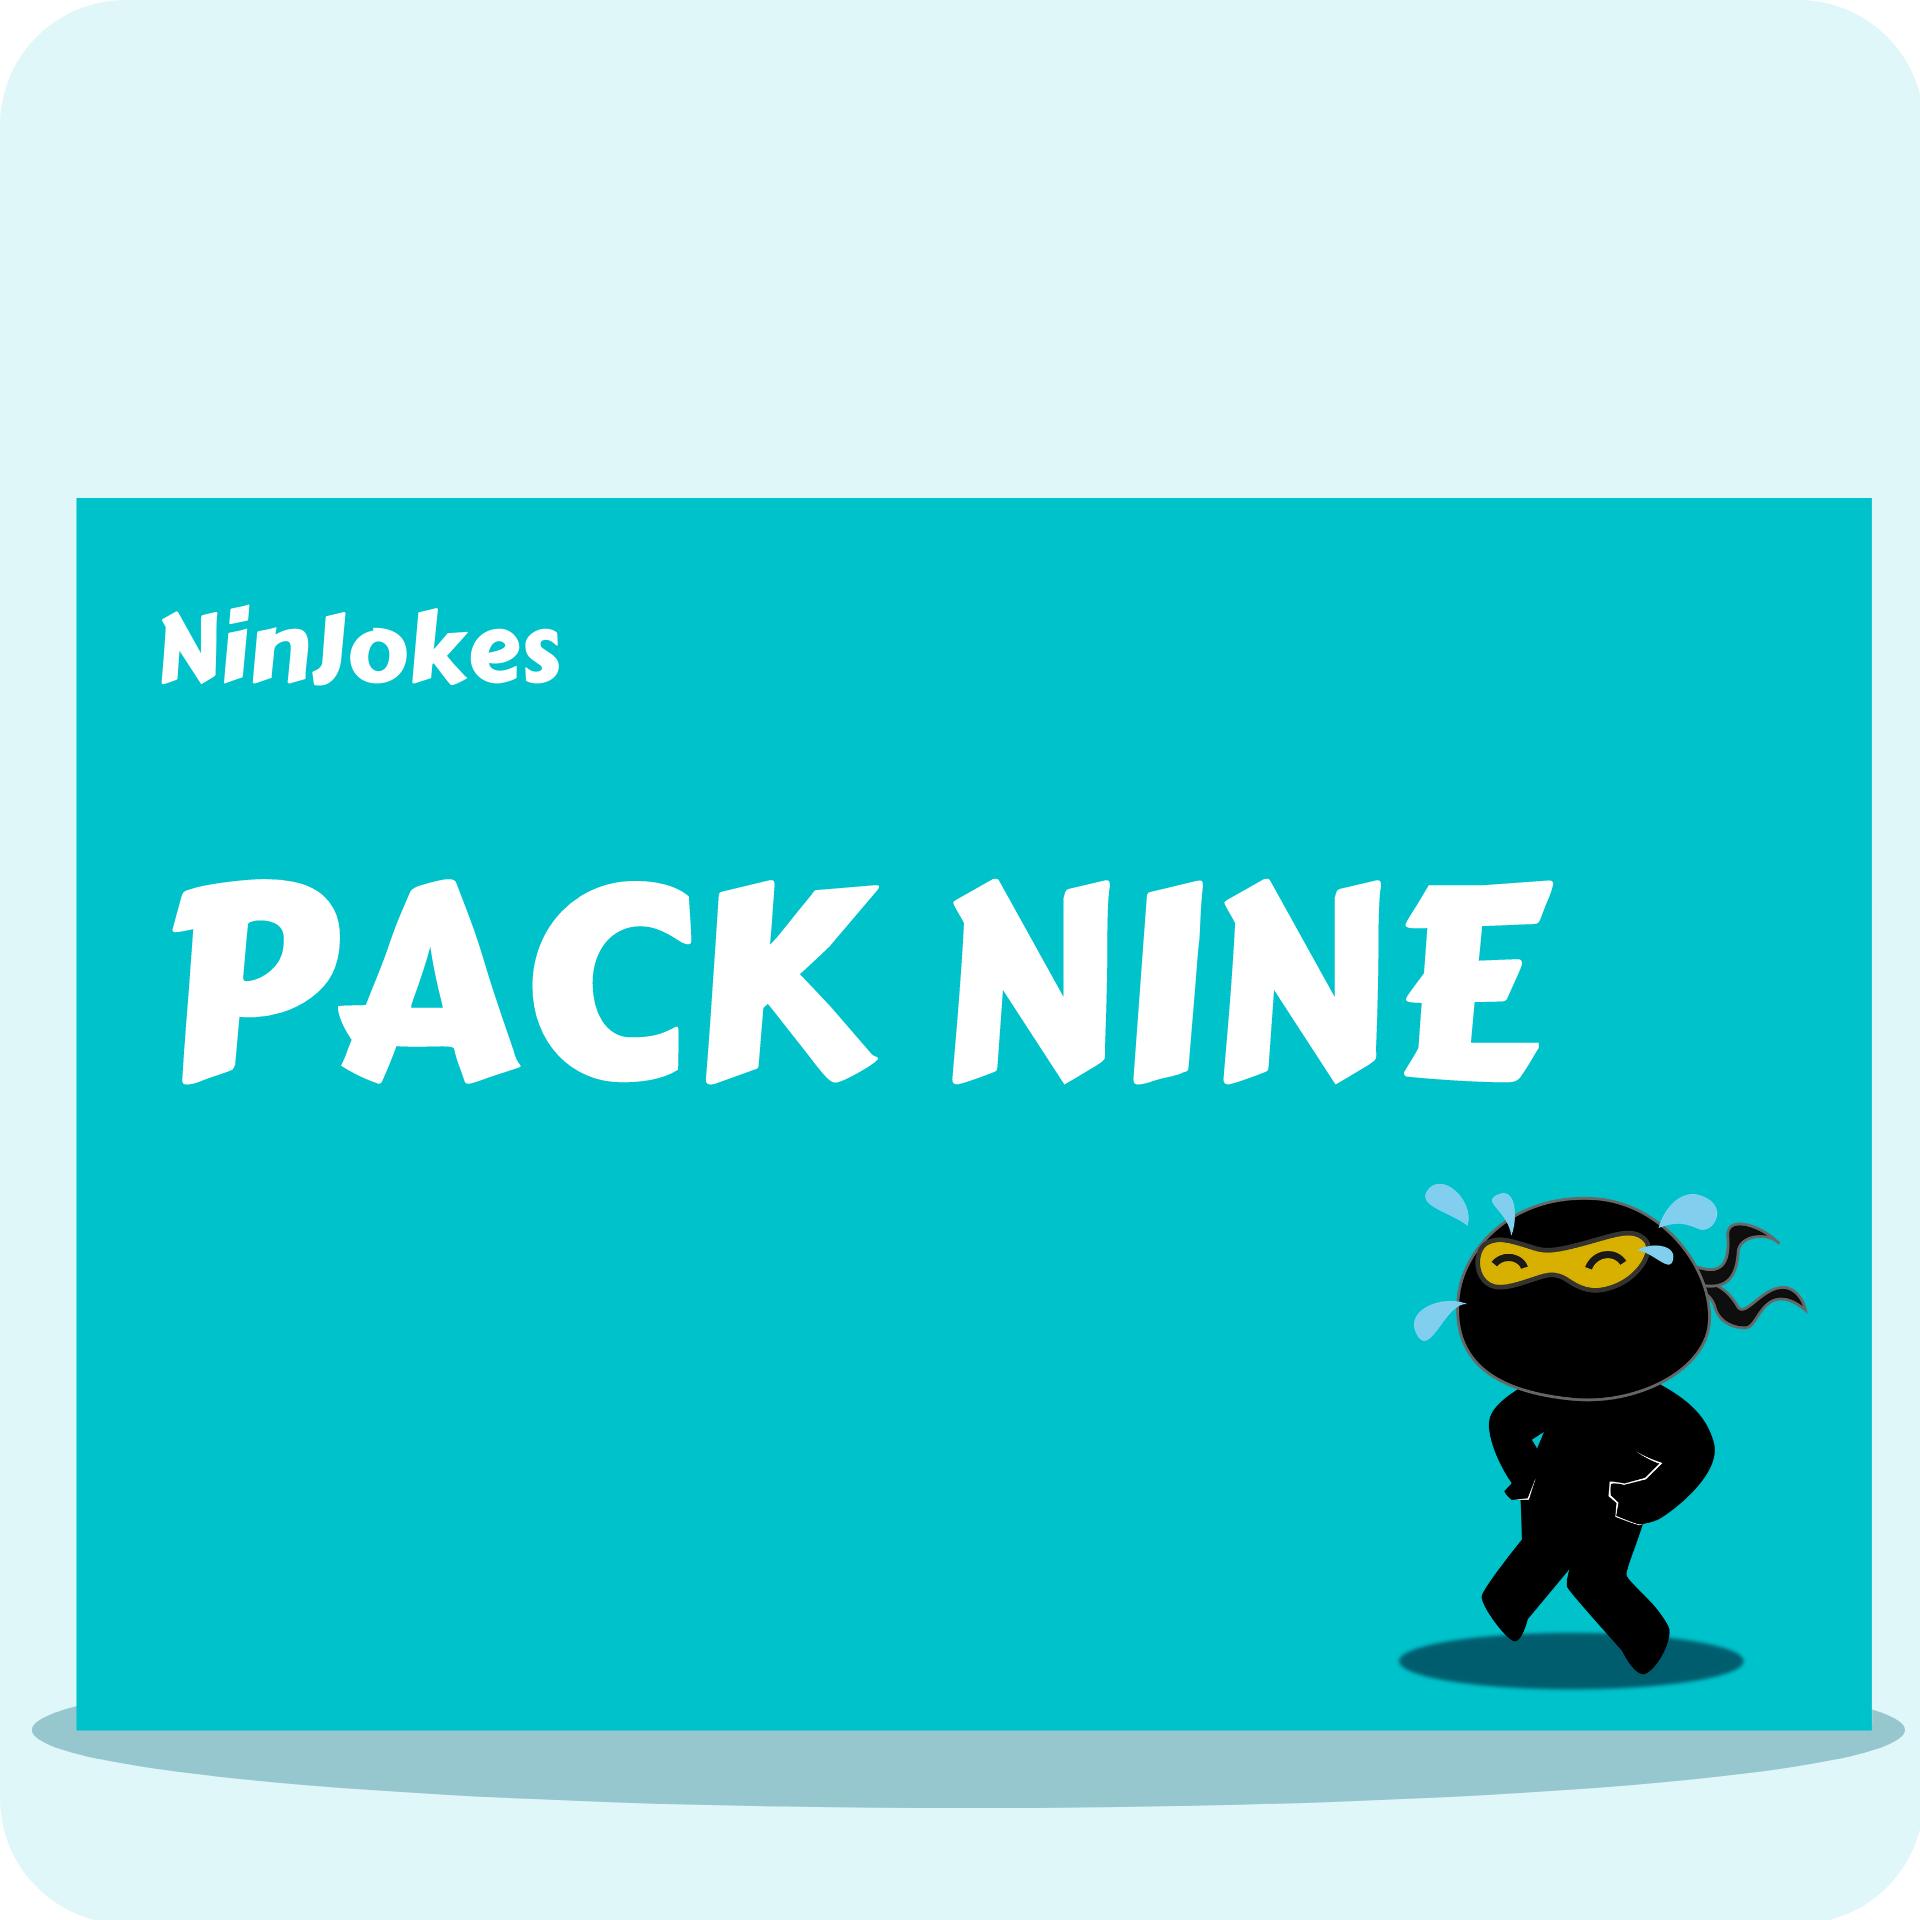 NinJokes Pack Nine